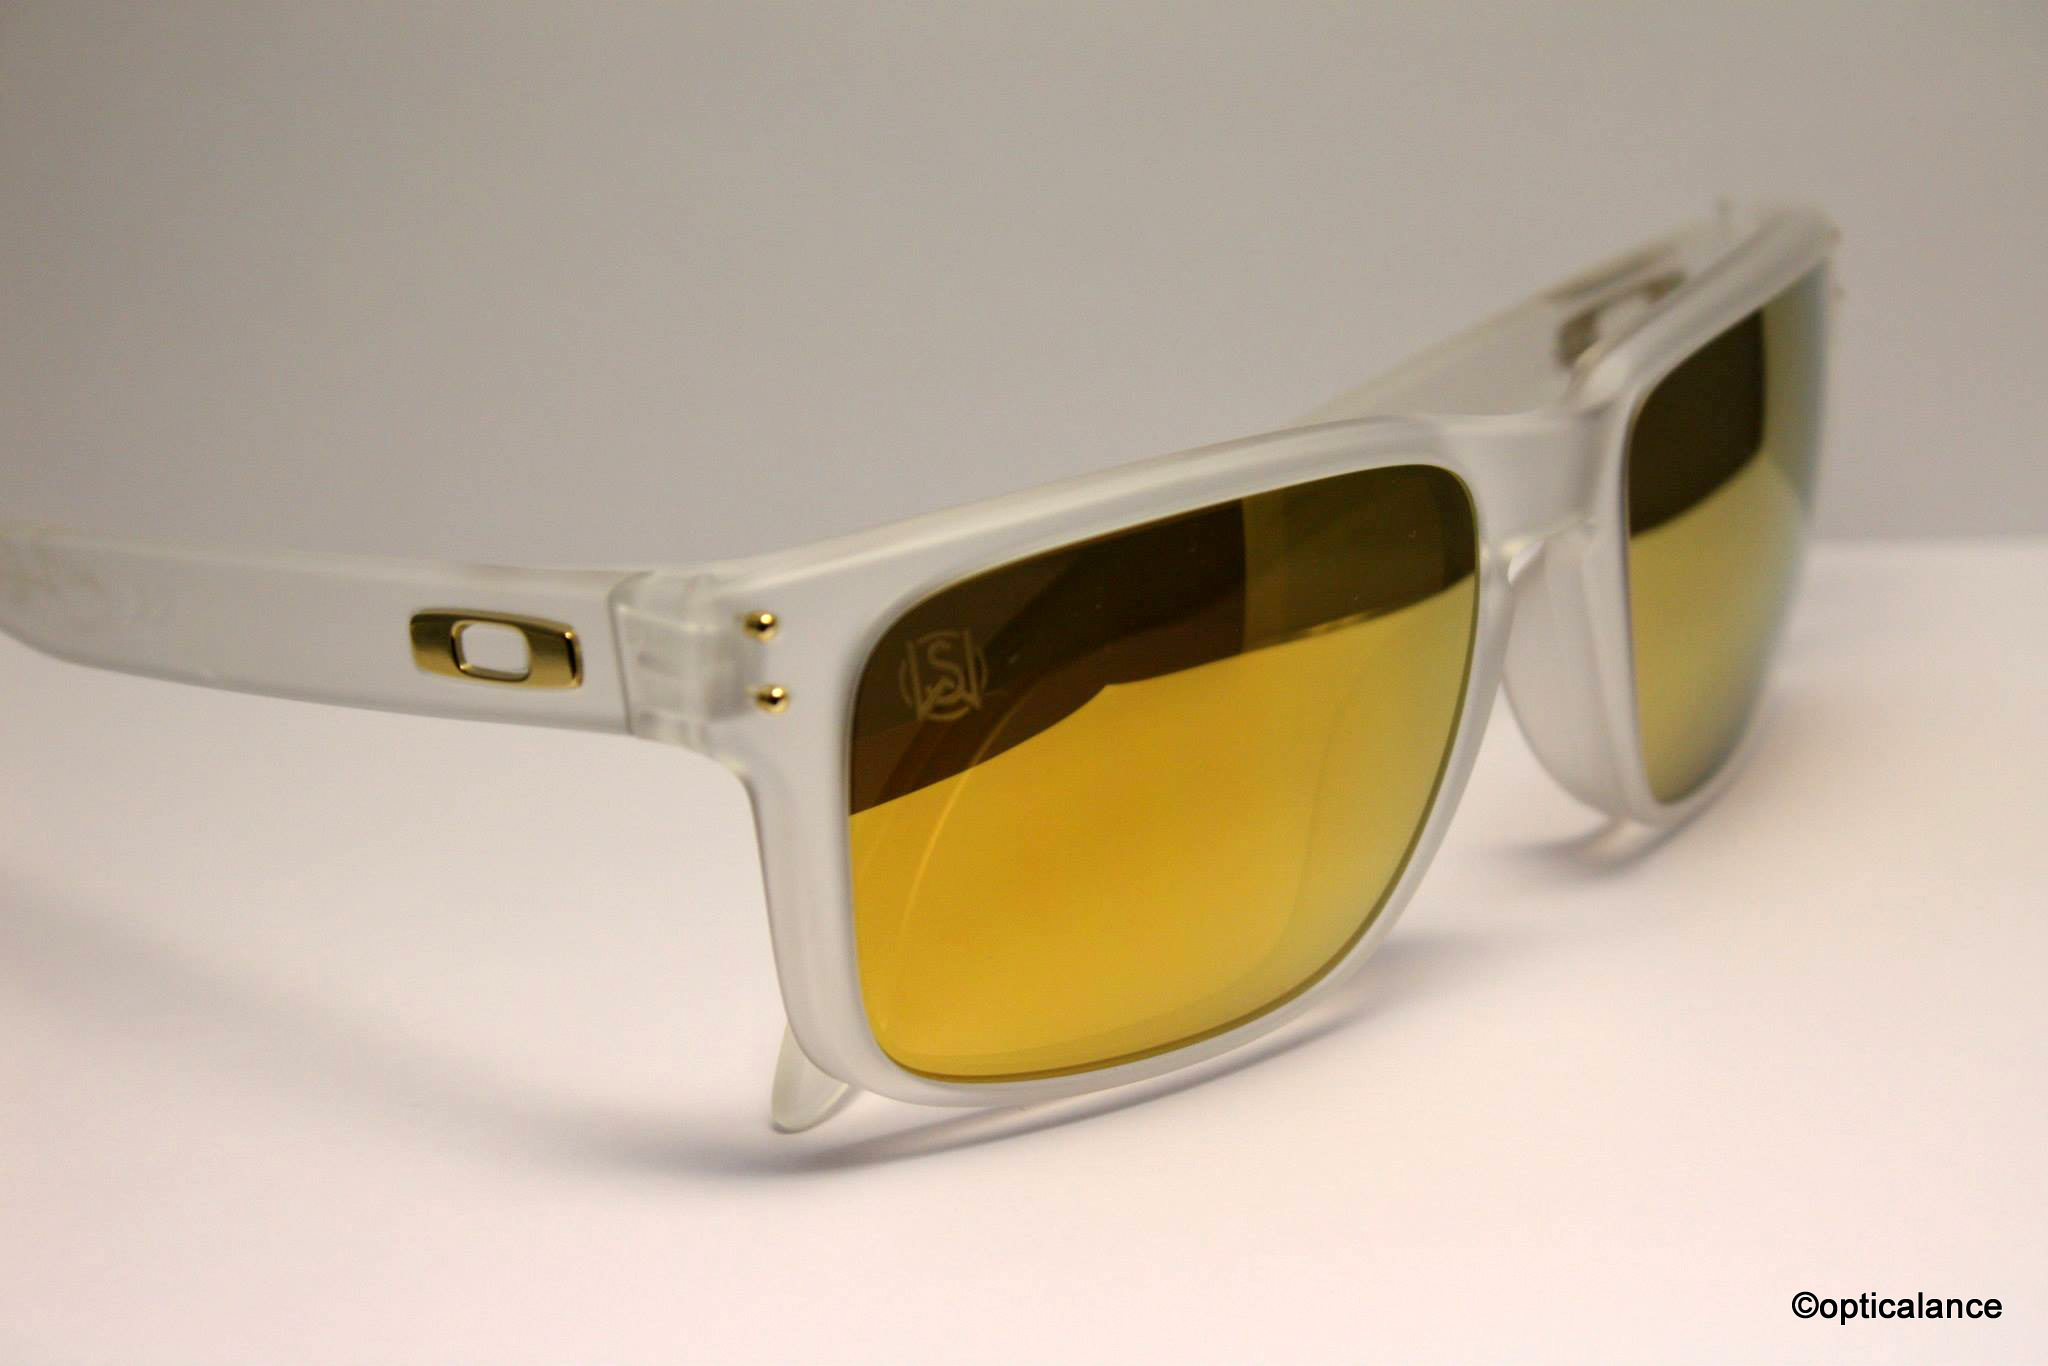 969a0a777c6 oakley shaun white holbrook mens sunglasses polished black 24k iridium